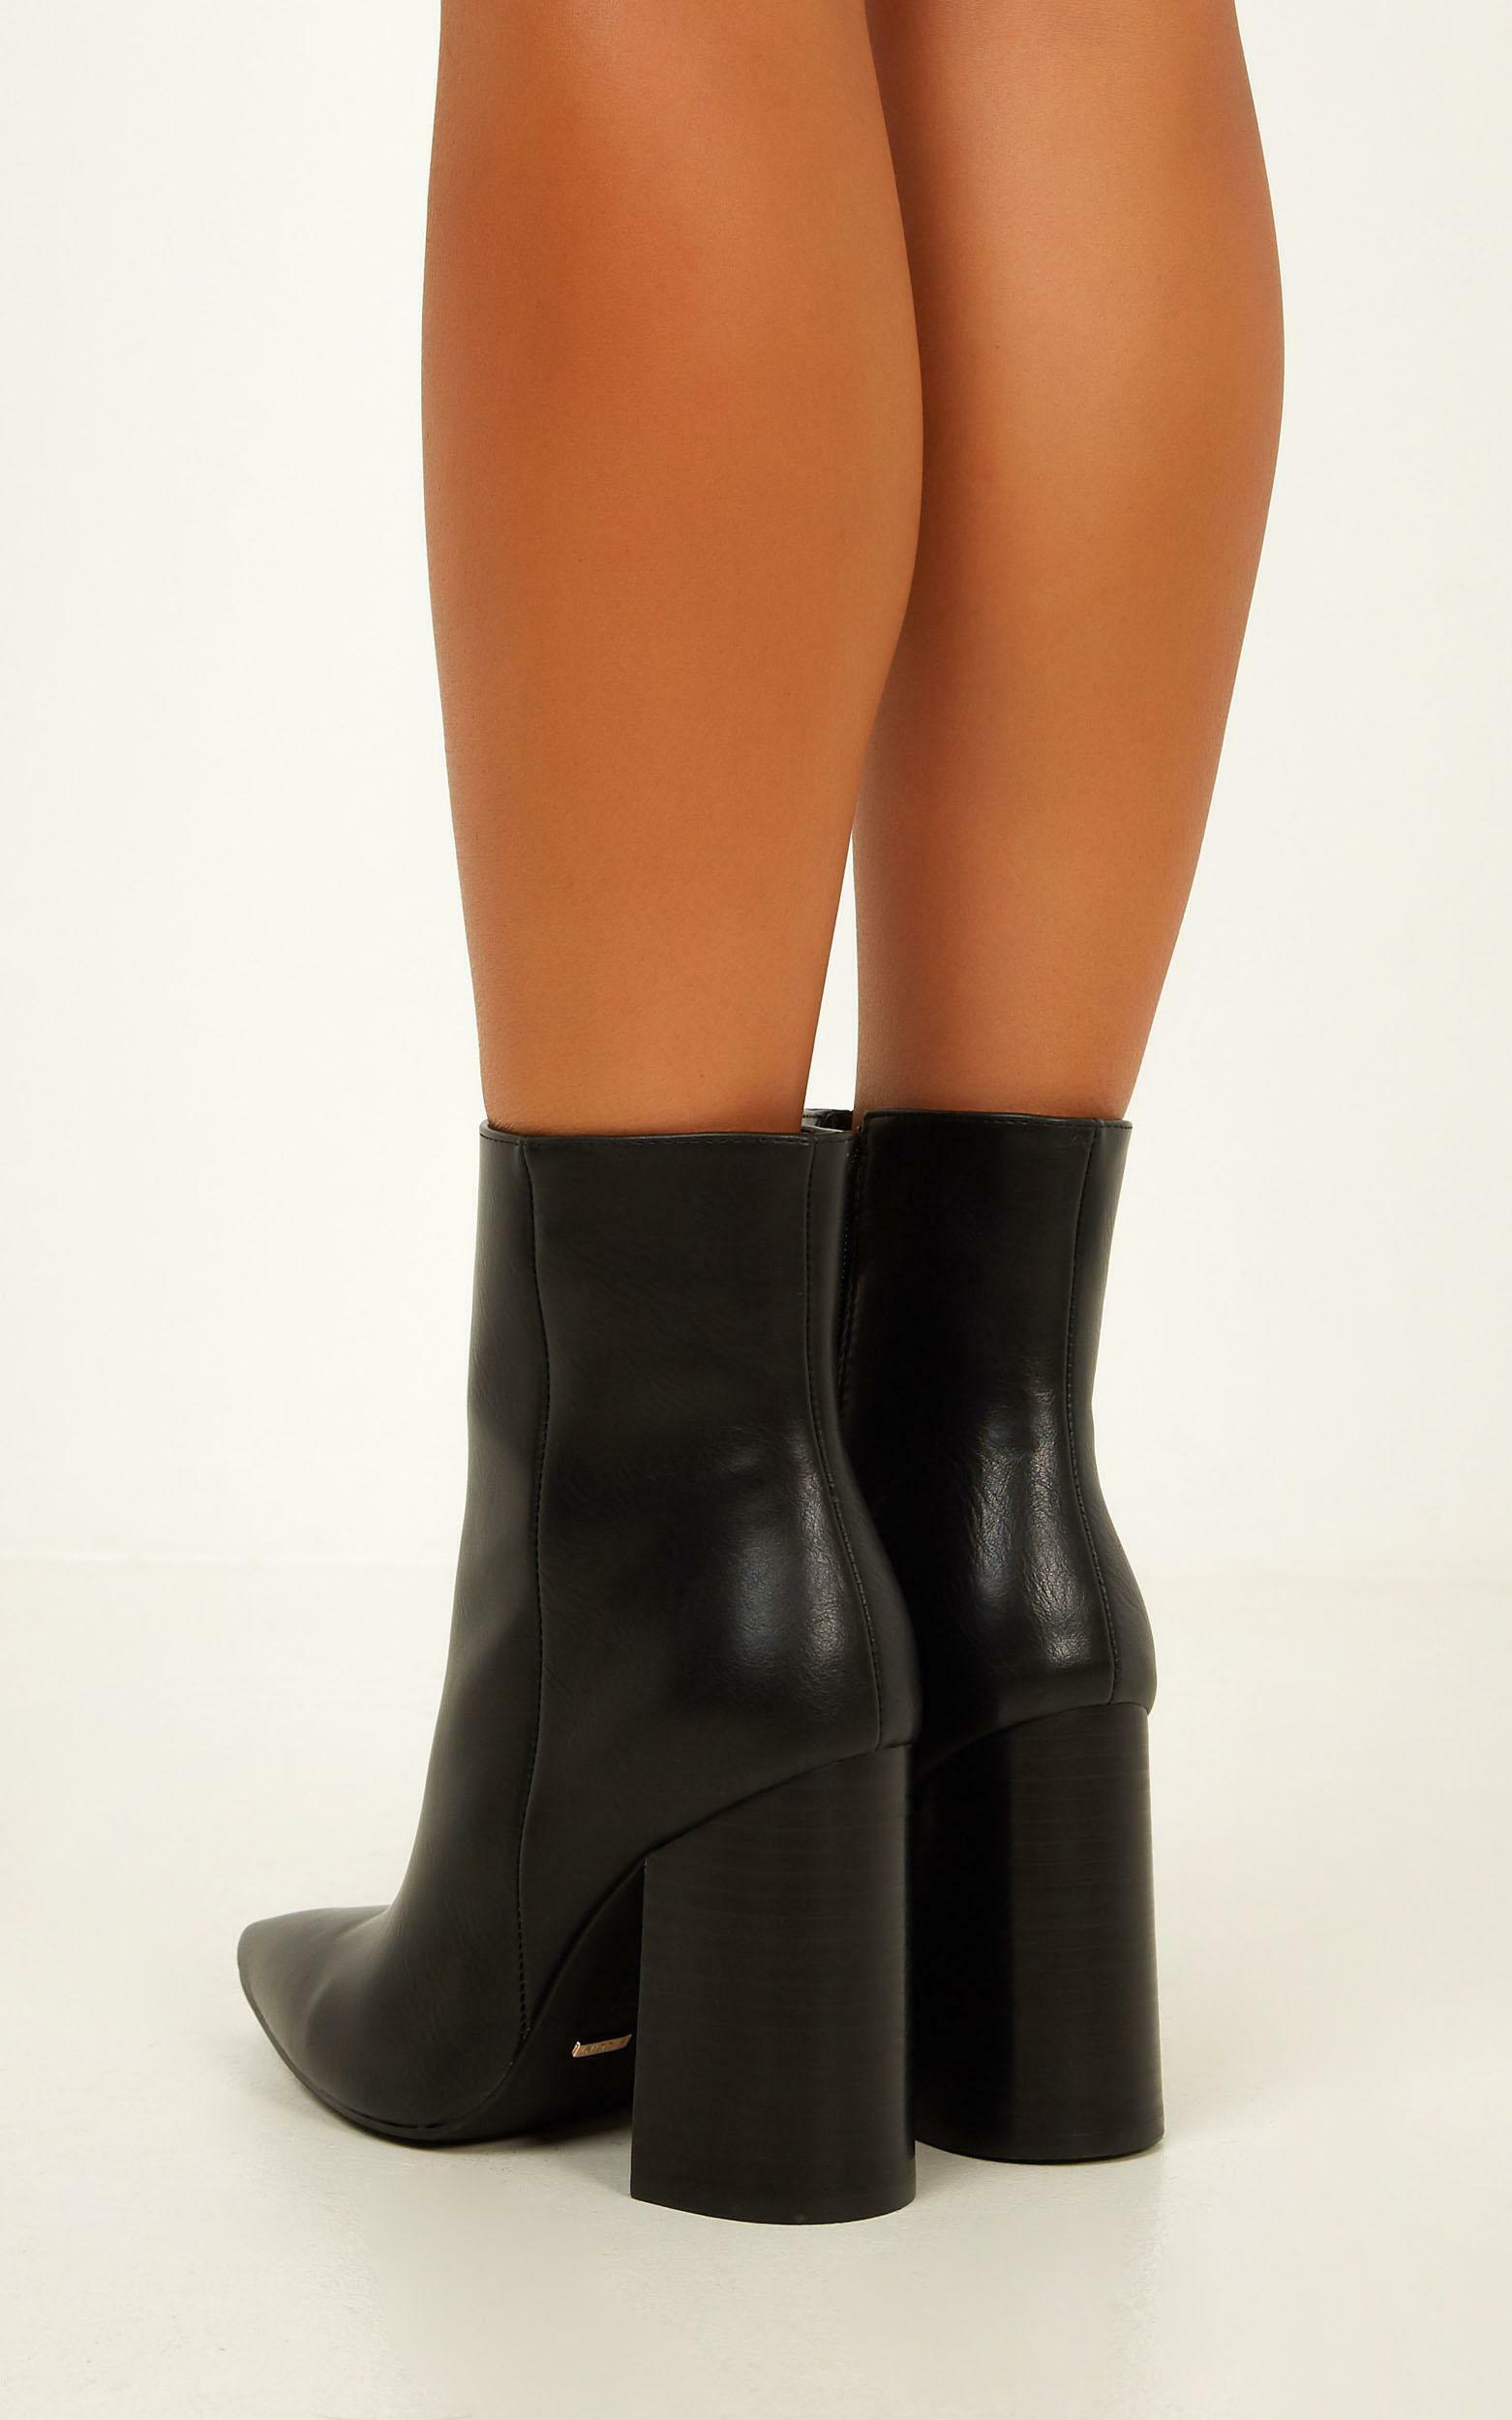 Billini - Tio boots in black - 10, Black, hi-res image number null